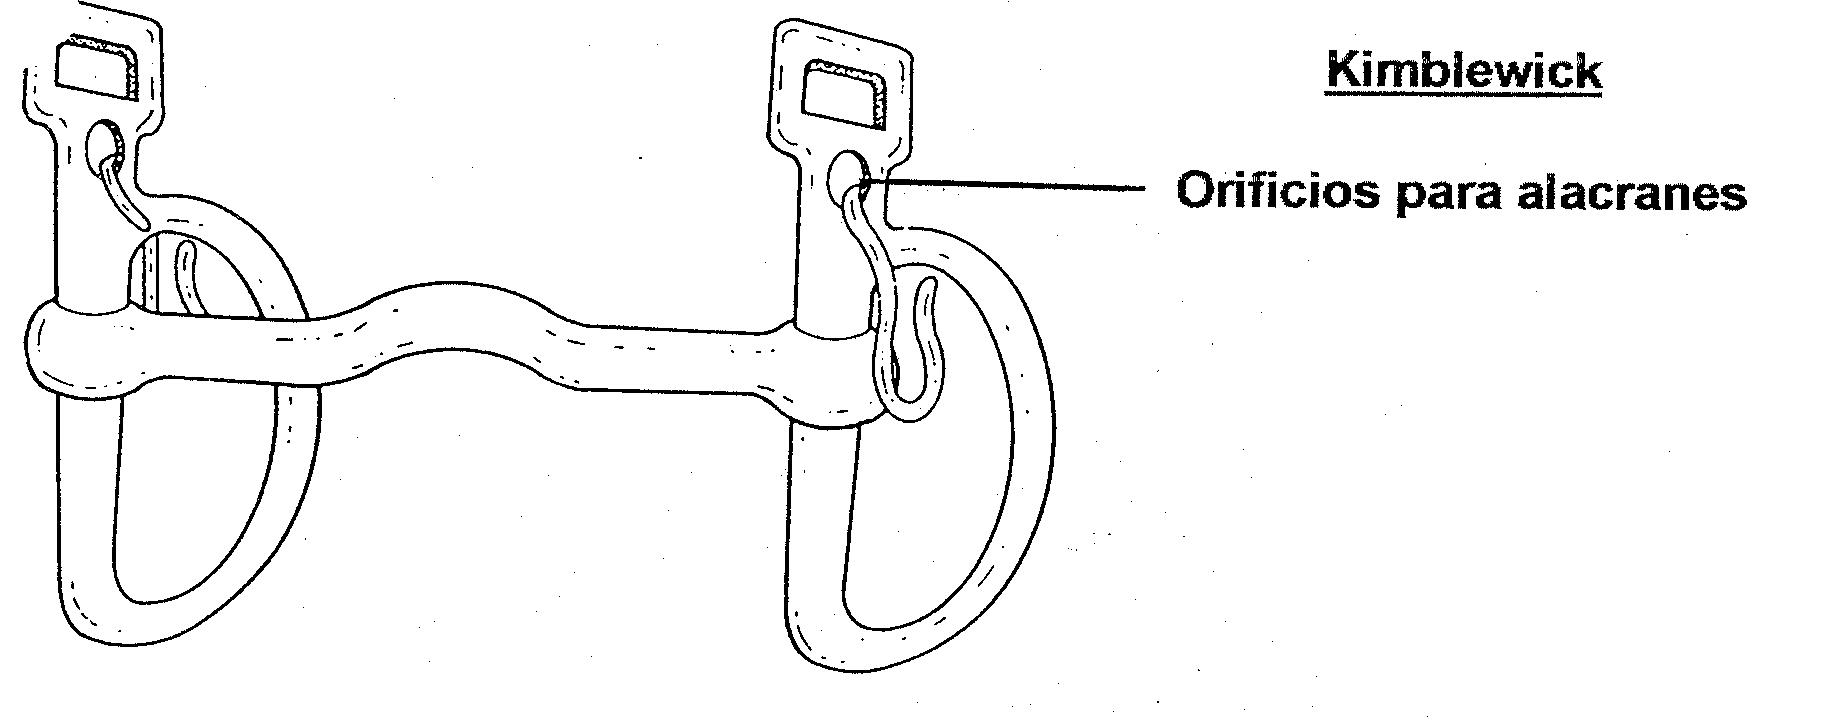 Embocaduras